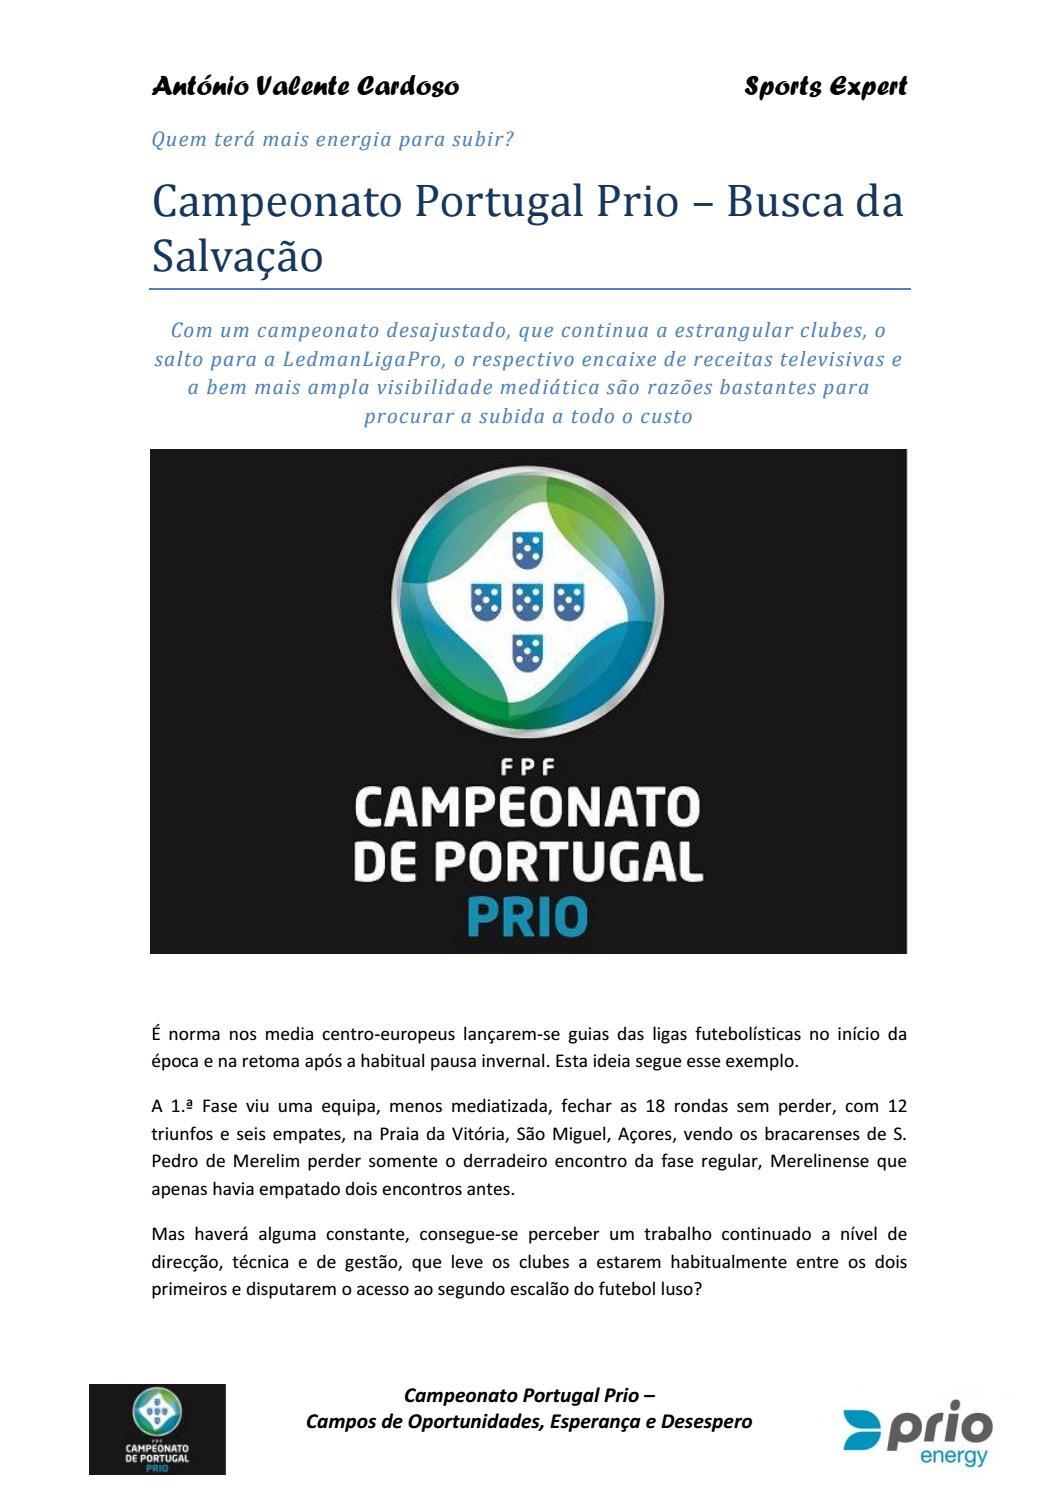 Campeonato Portugal Prio 1617 Guia Mediático Intermédio by Antonio Cardoso  - issuu d1f32237ef34e